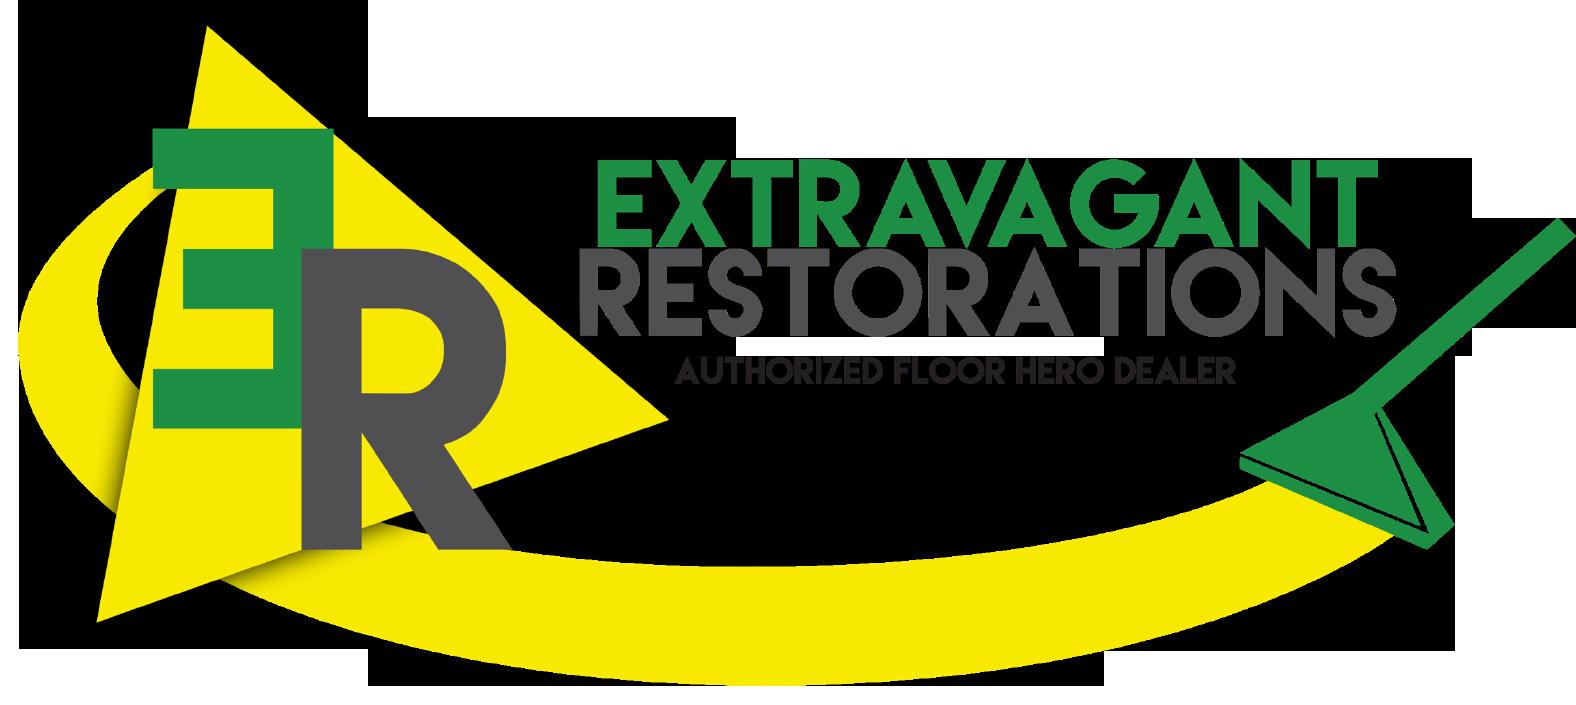 Extravagant Restorations